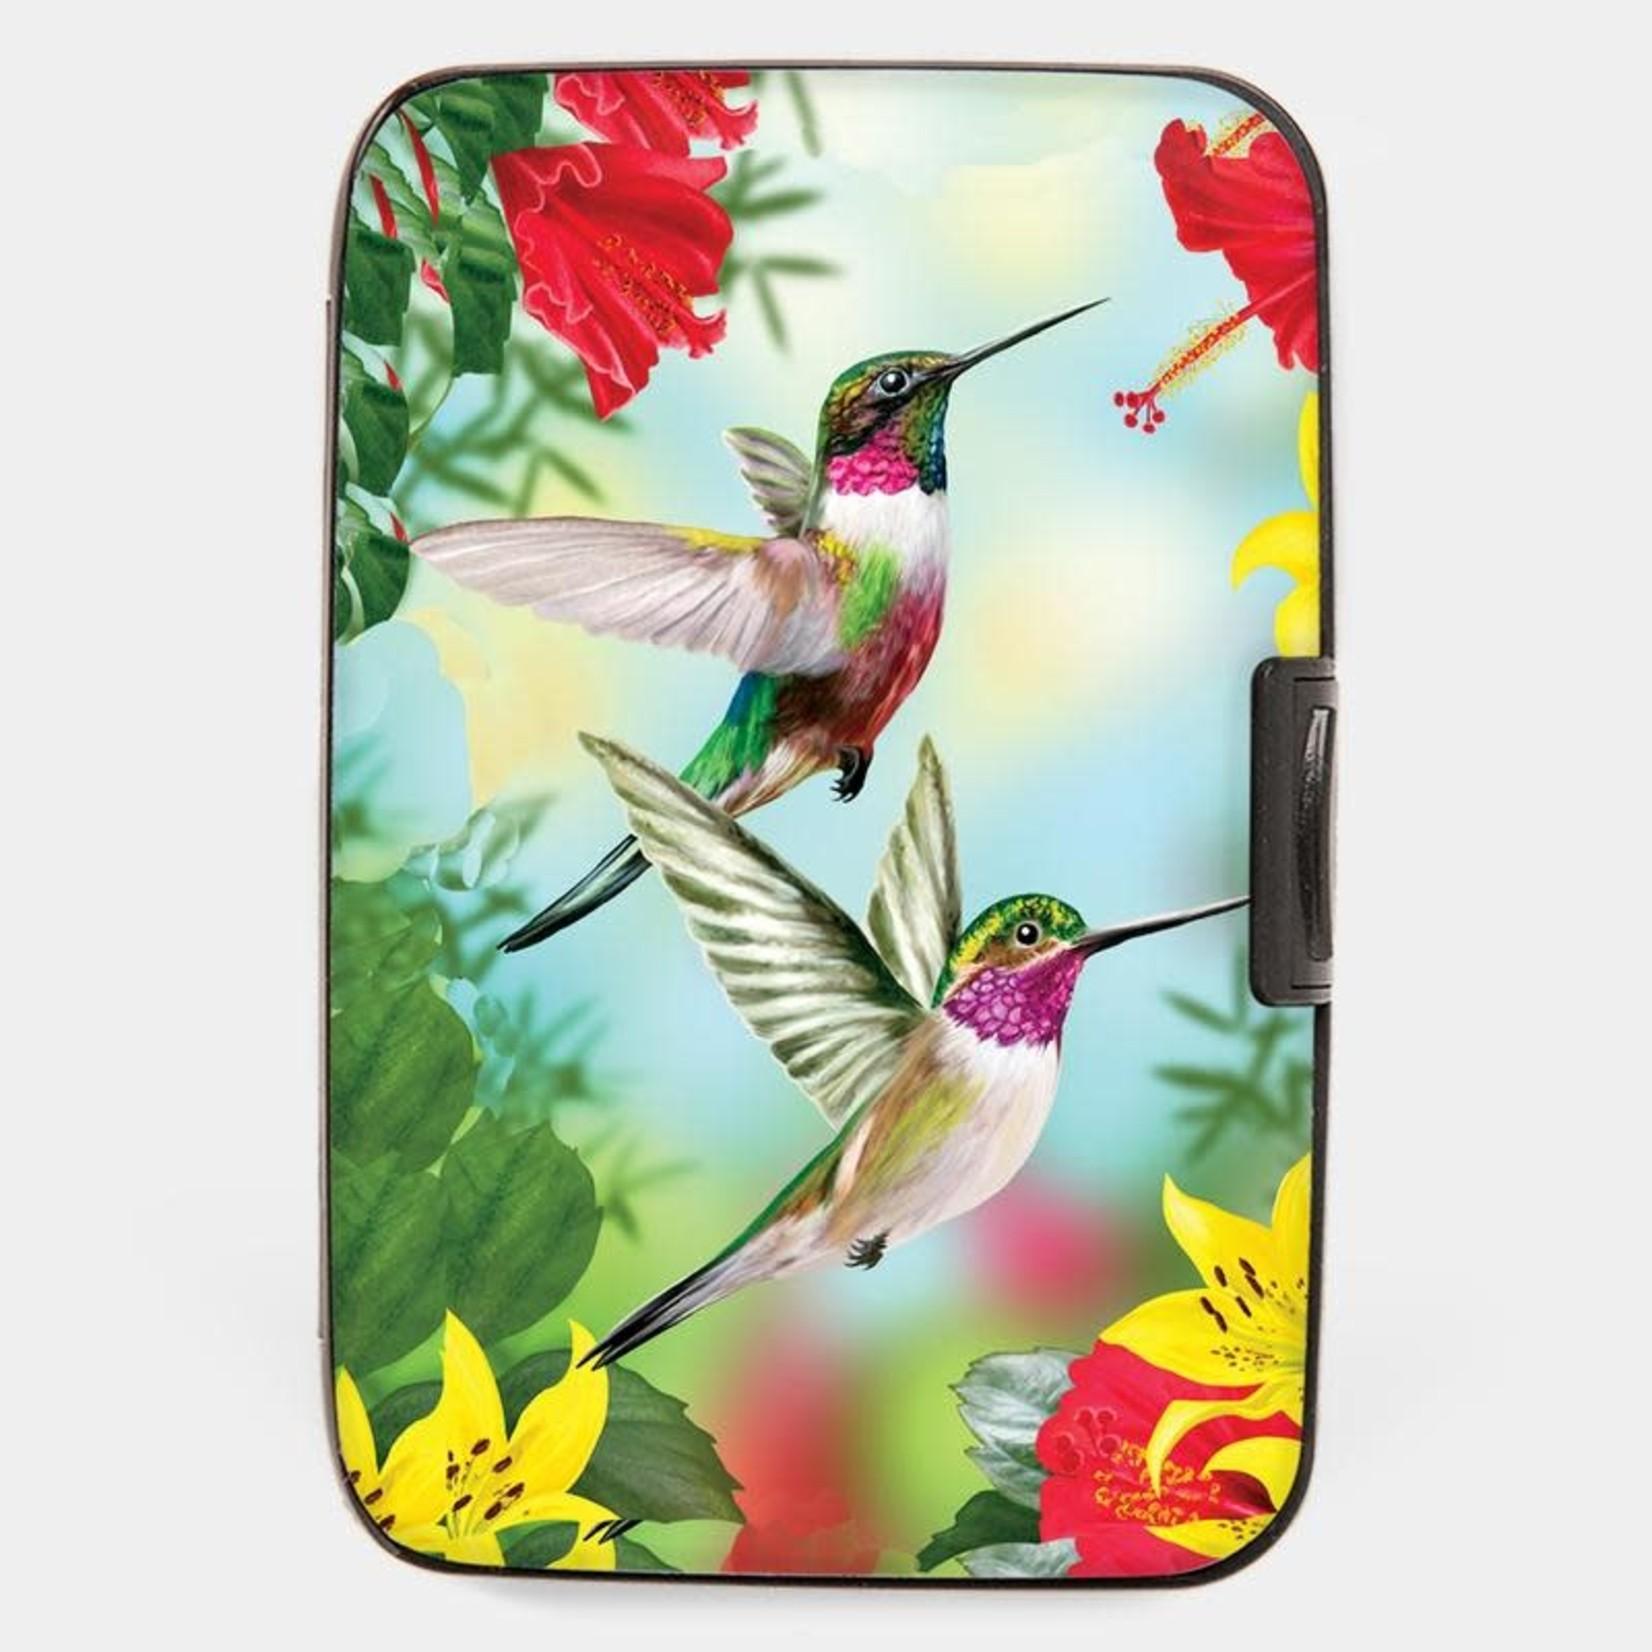 Monarque Armored Wallet - Hummingbird Red